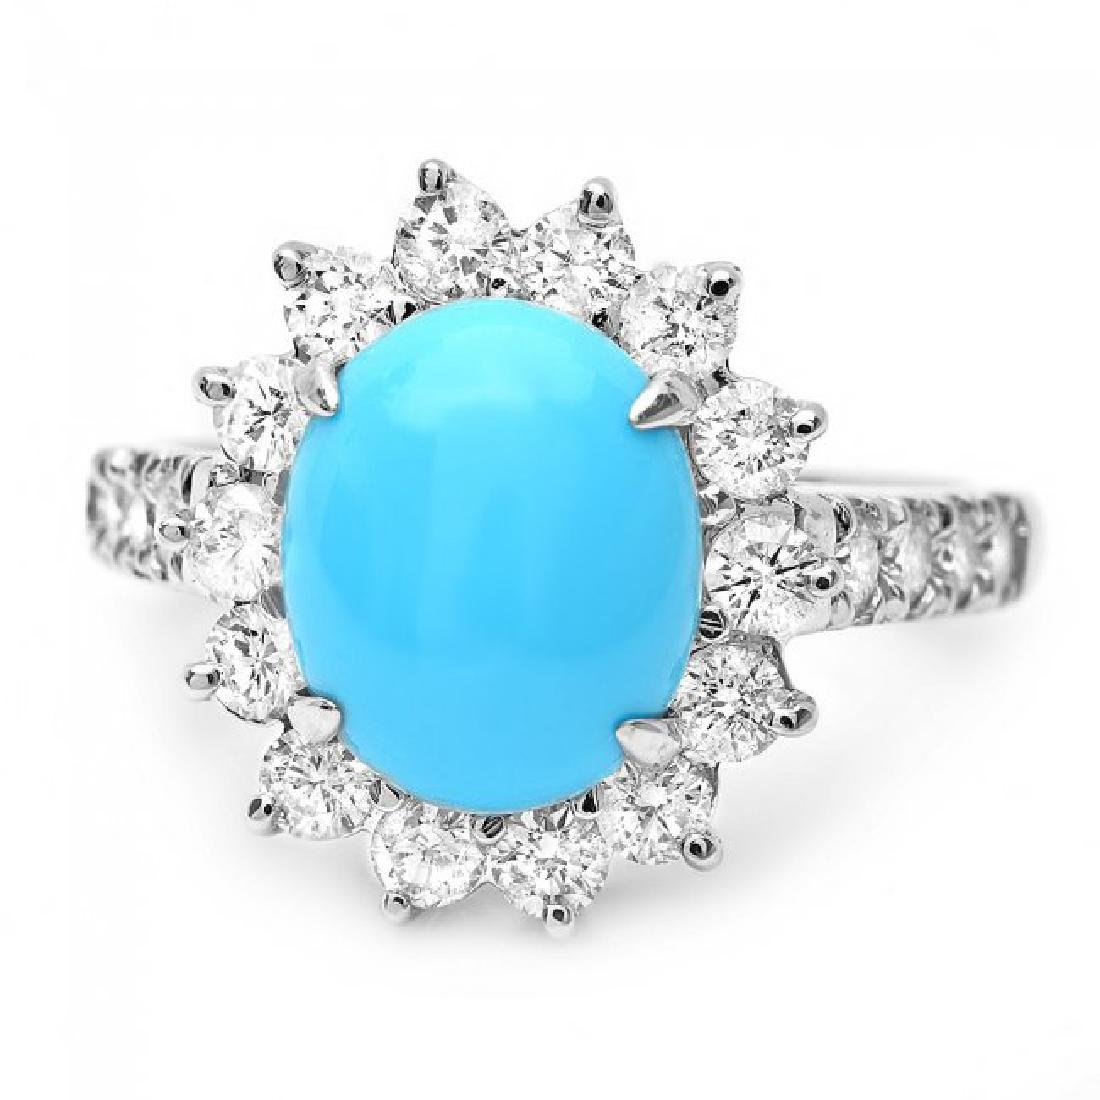 14k Gold 2.50ct Turquoise 1.20ct Diamond Ring - 2